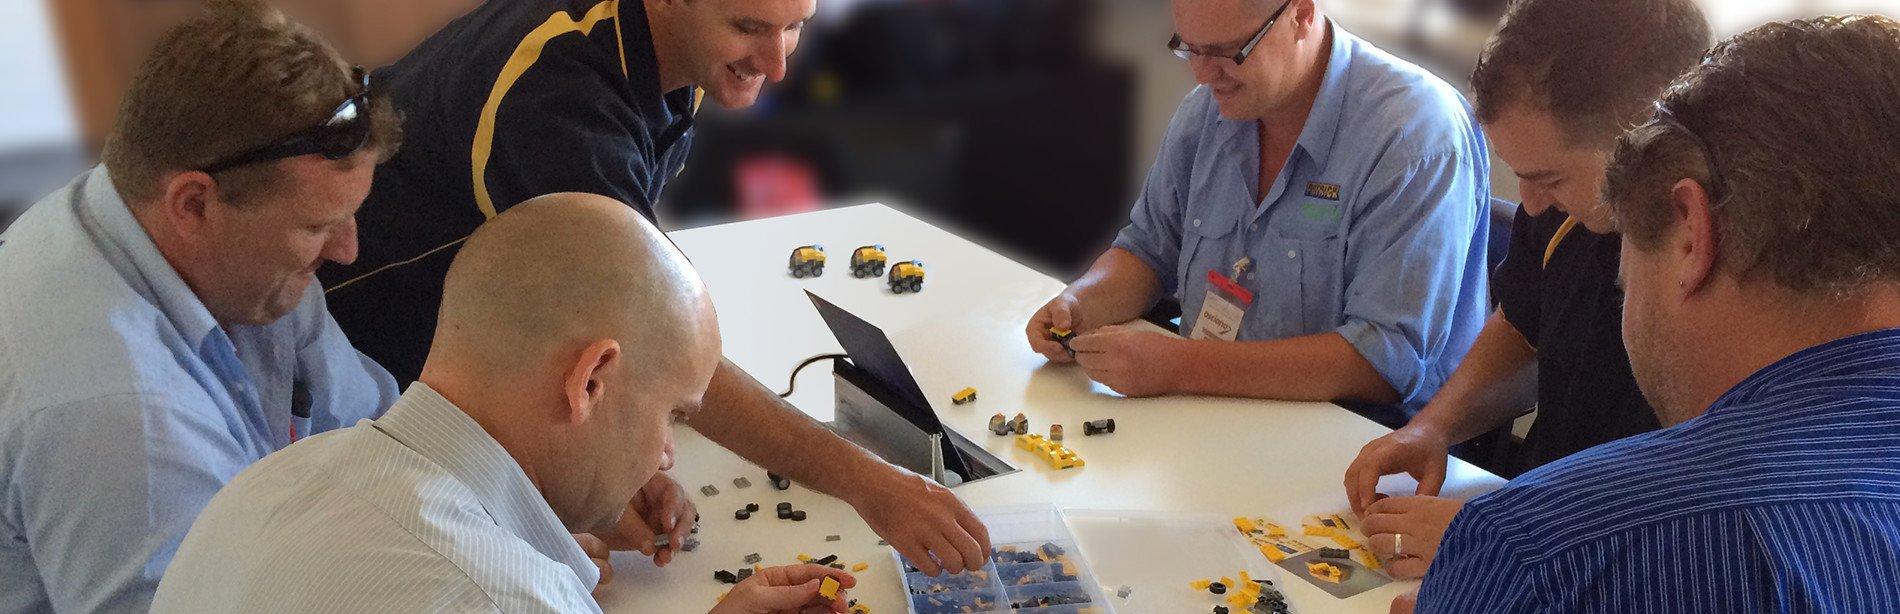 Gestaltix Lego Kit image